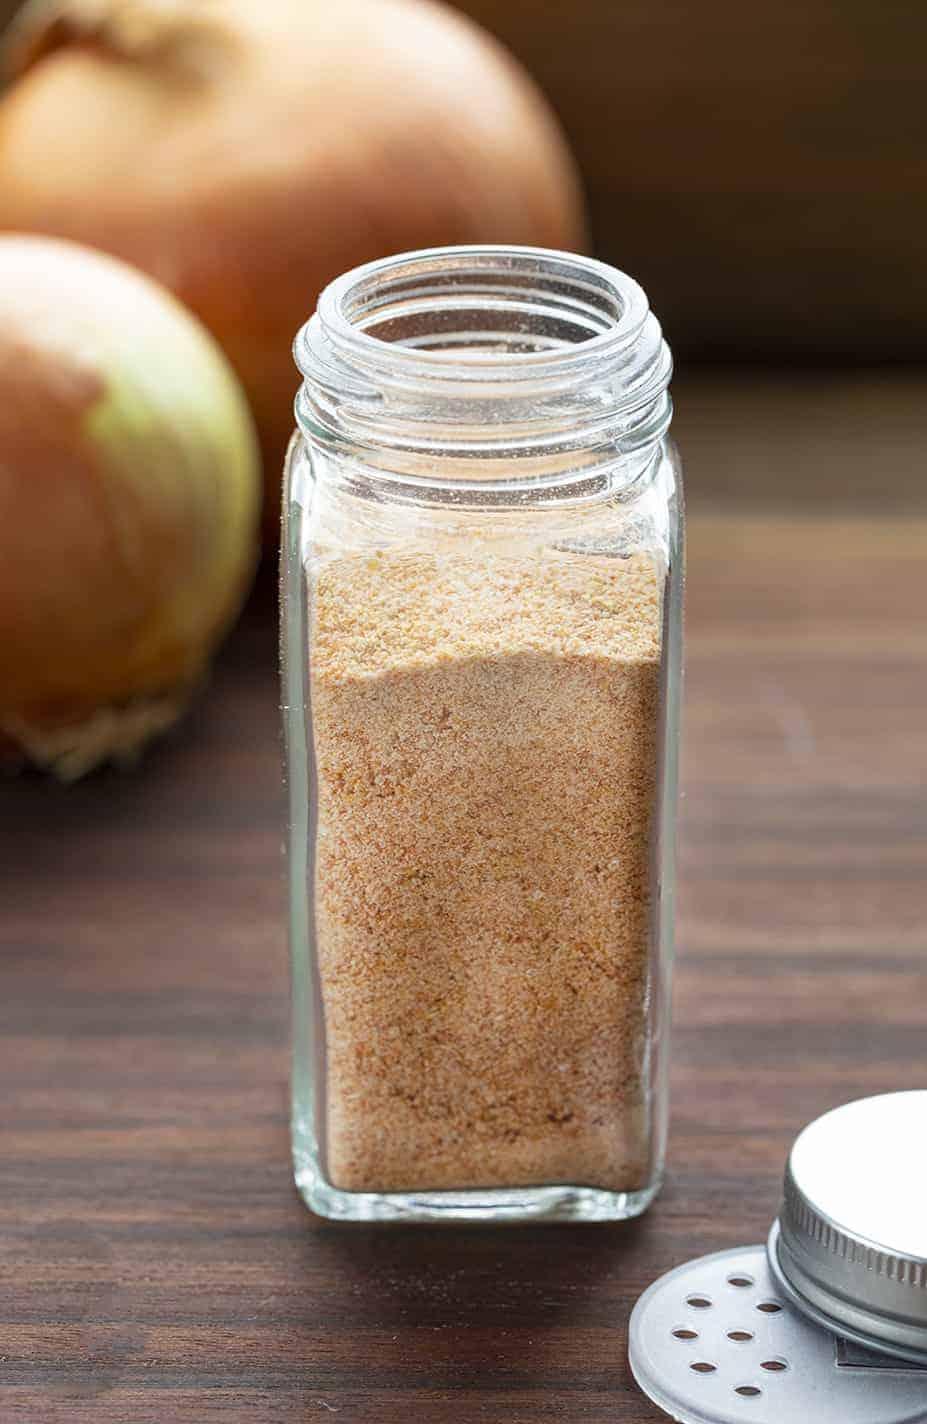 Homemade Onion Powder in Bottle